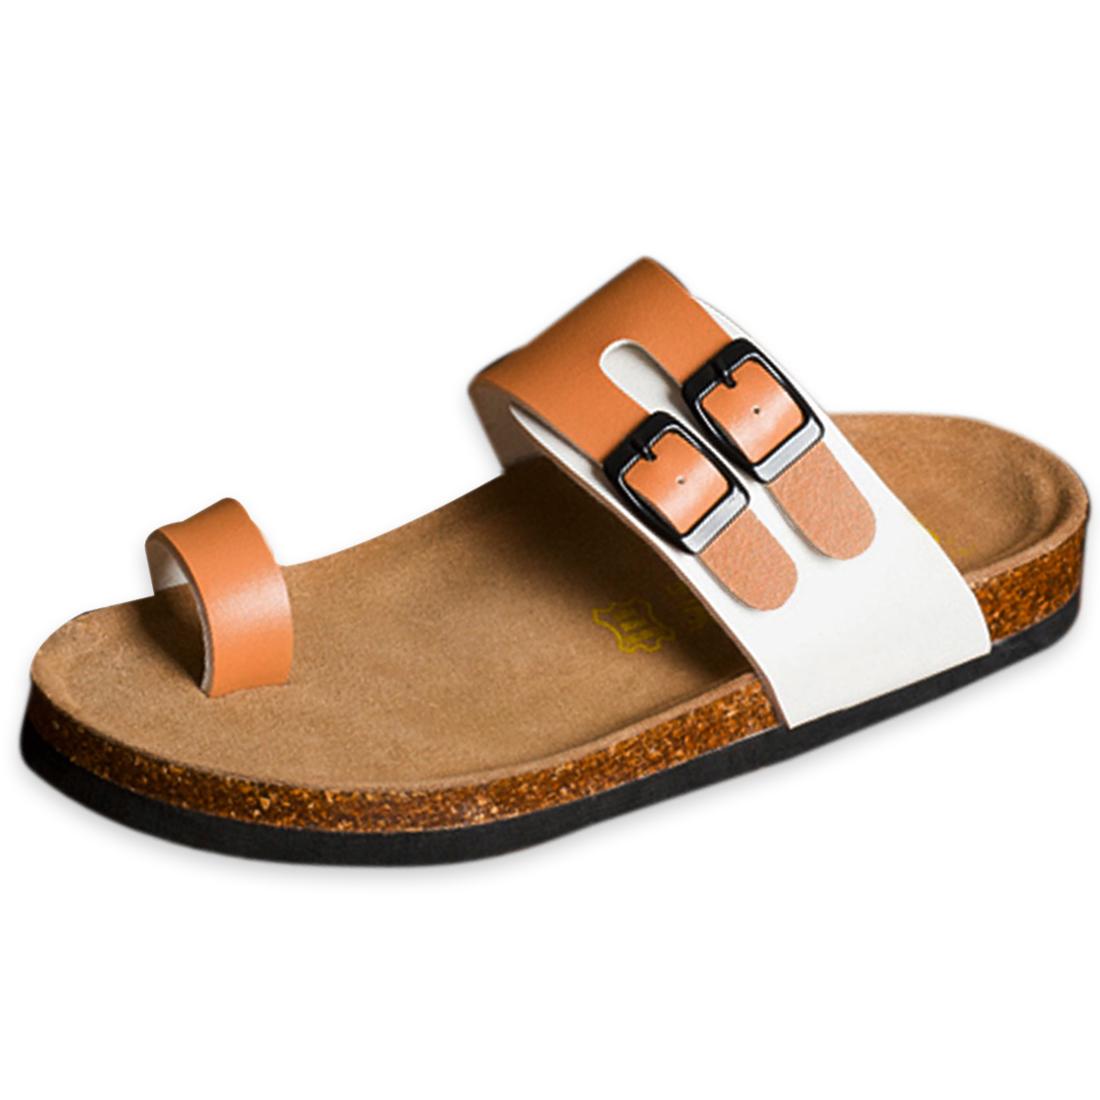 Men Roomy Toe Box Two Flexible Straps Sandal Coffee White US Size 6.5